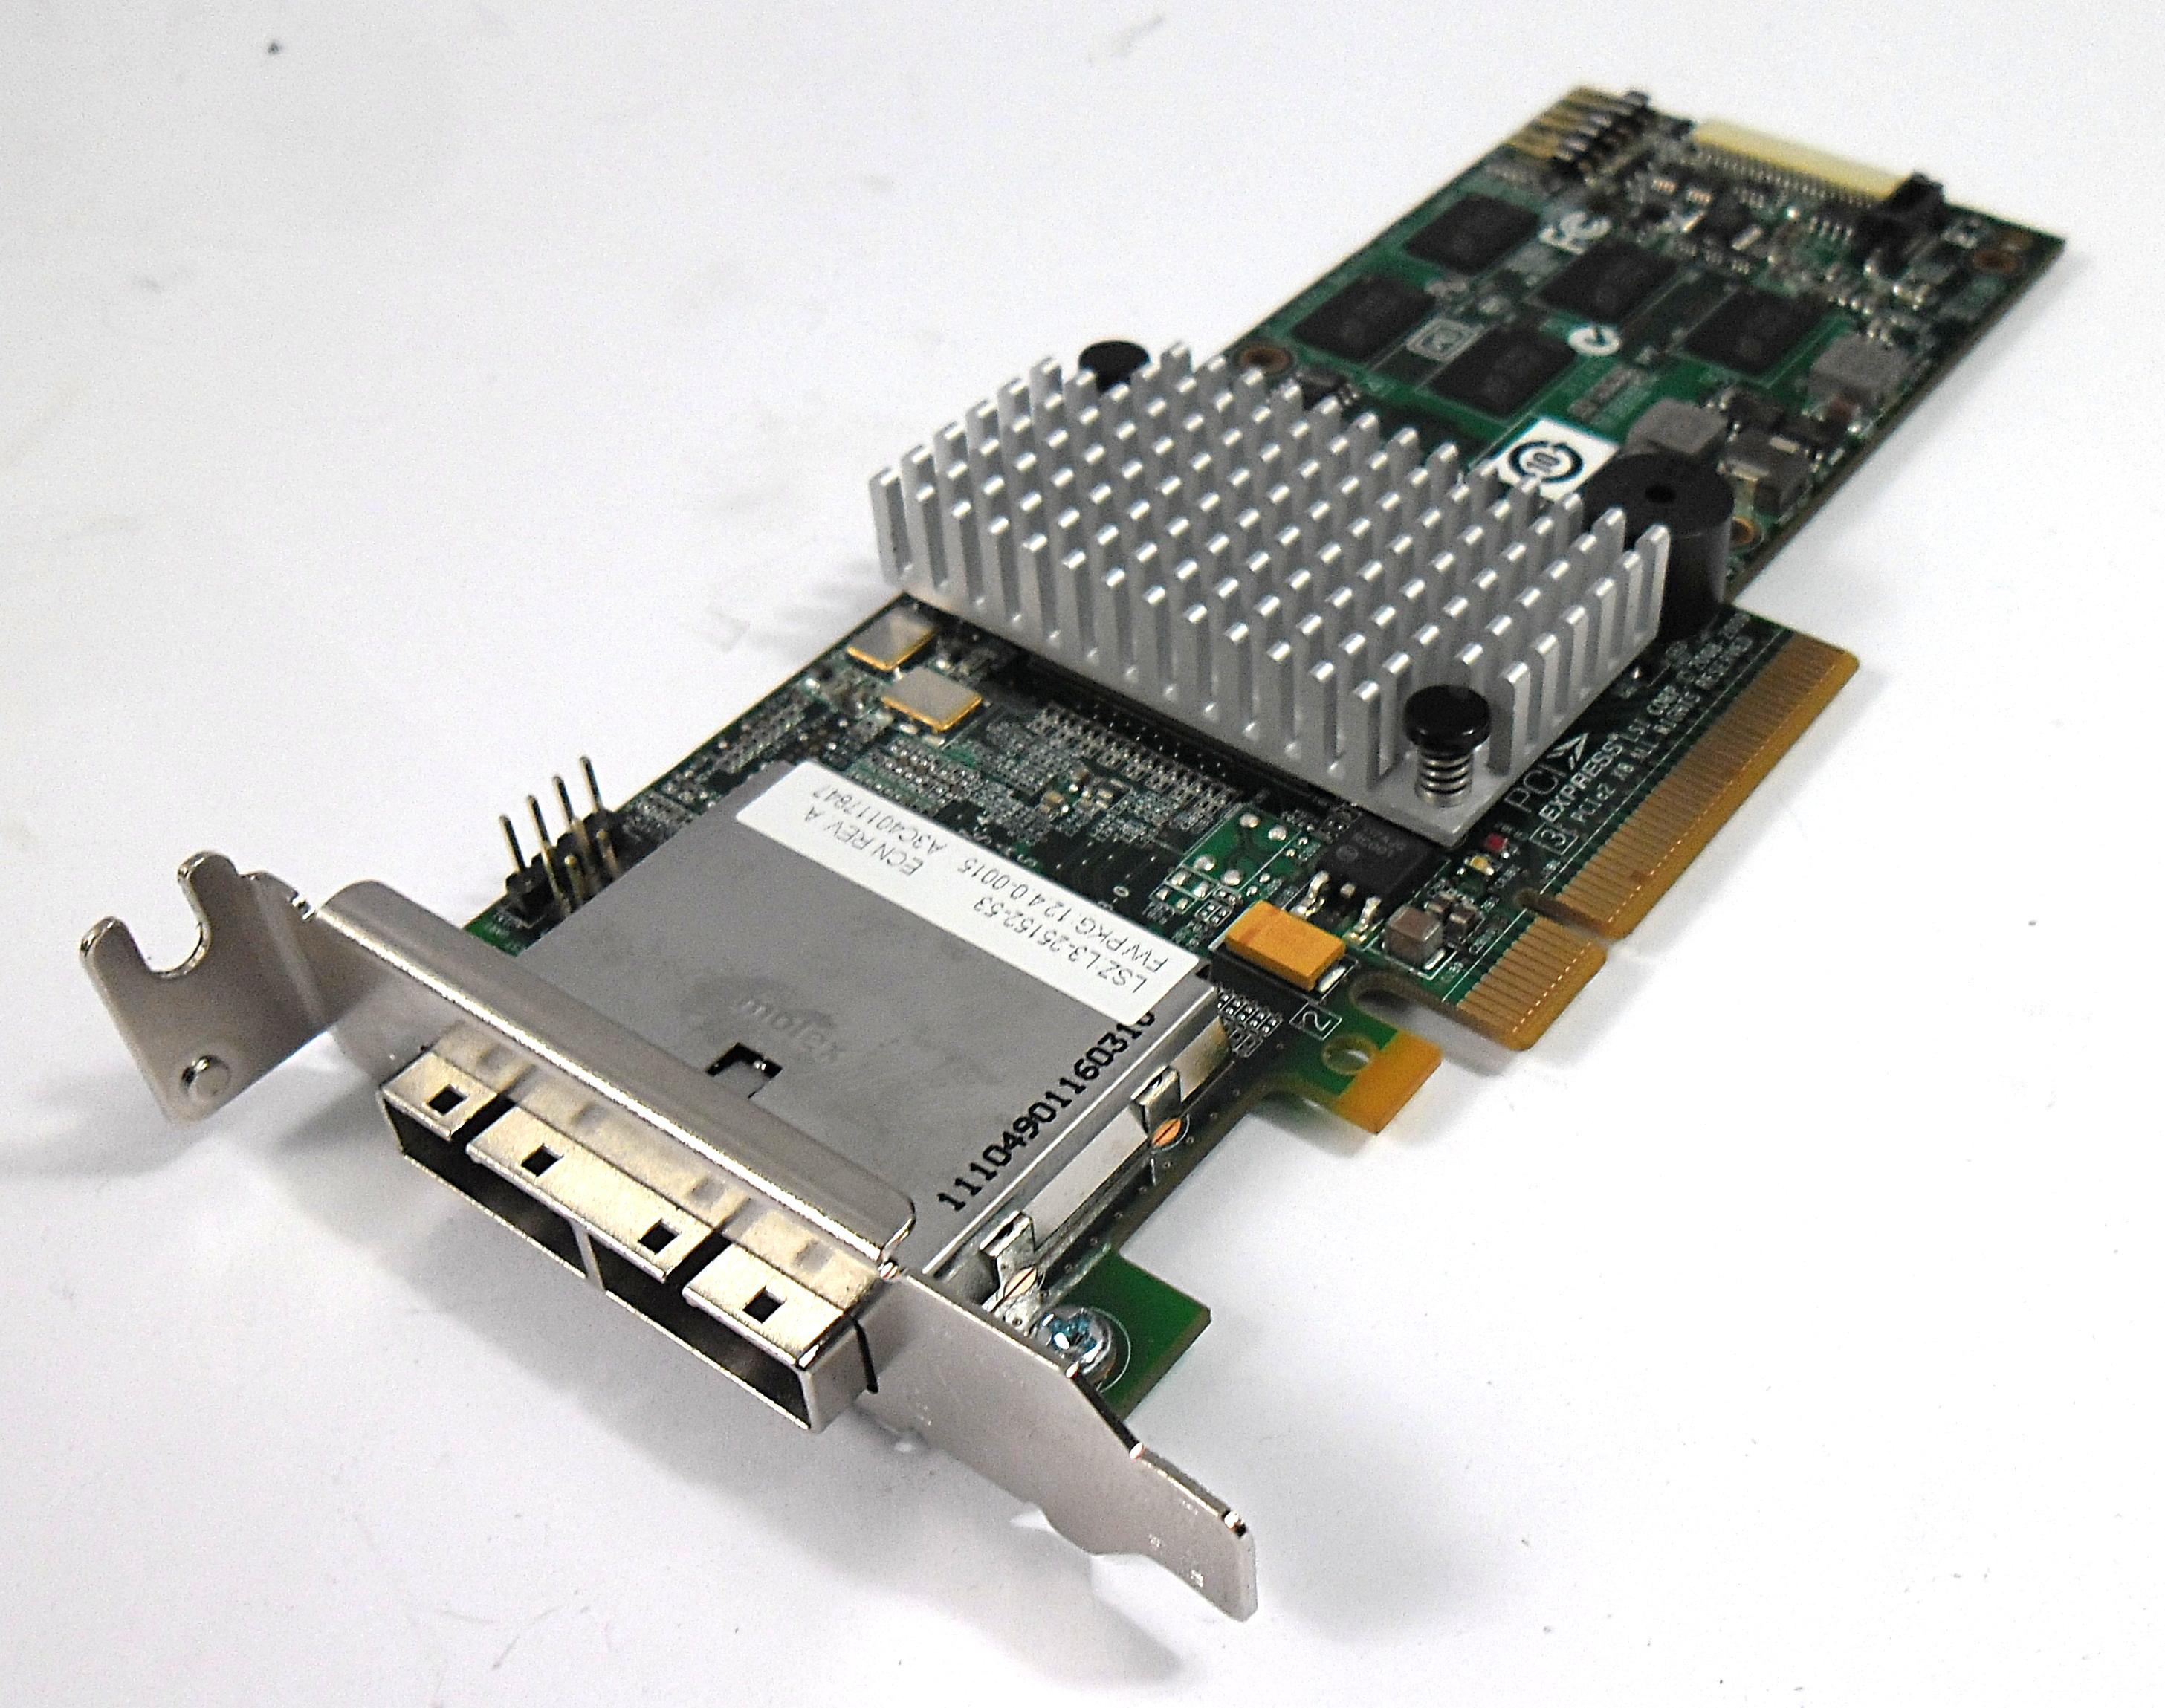 Fujitsu A3C40117847 L3-25152-53A PCIe SAS RAID Controller Card Low